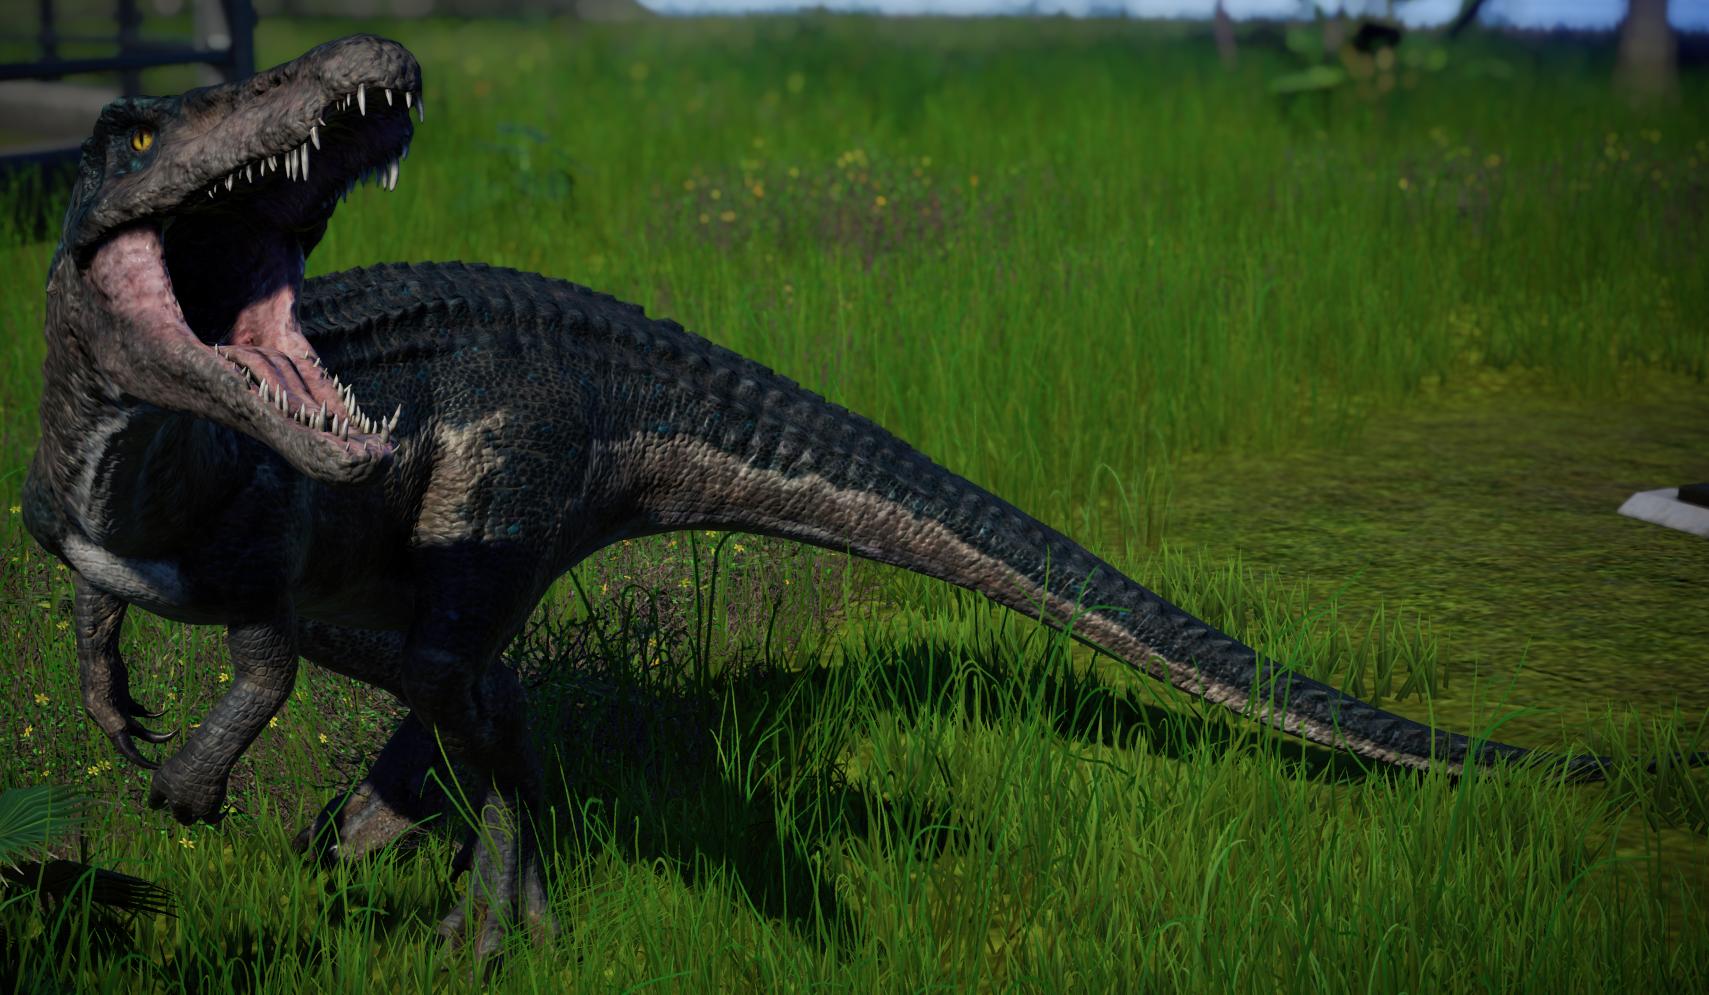 Baryonyx Jurassic World Evolution Wiki Fandom Powered By Wikia Jurassic World Jurassic World Dinosaurs Jurassic Park World